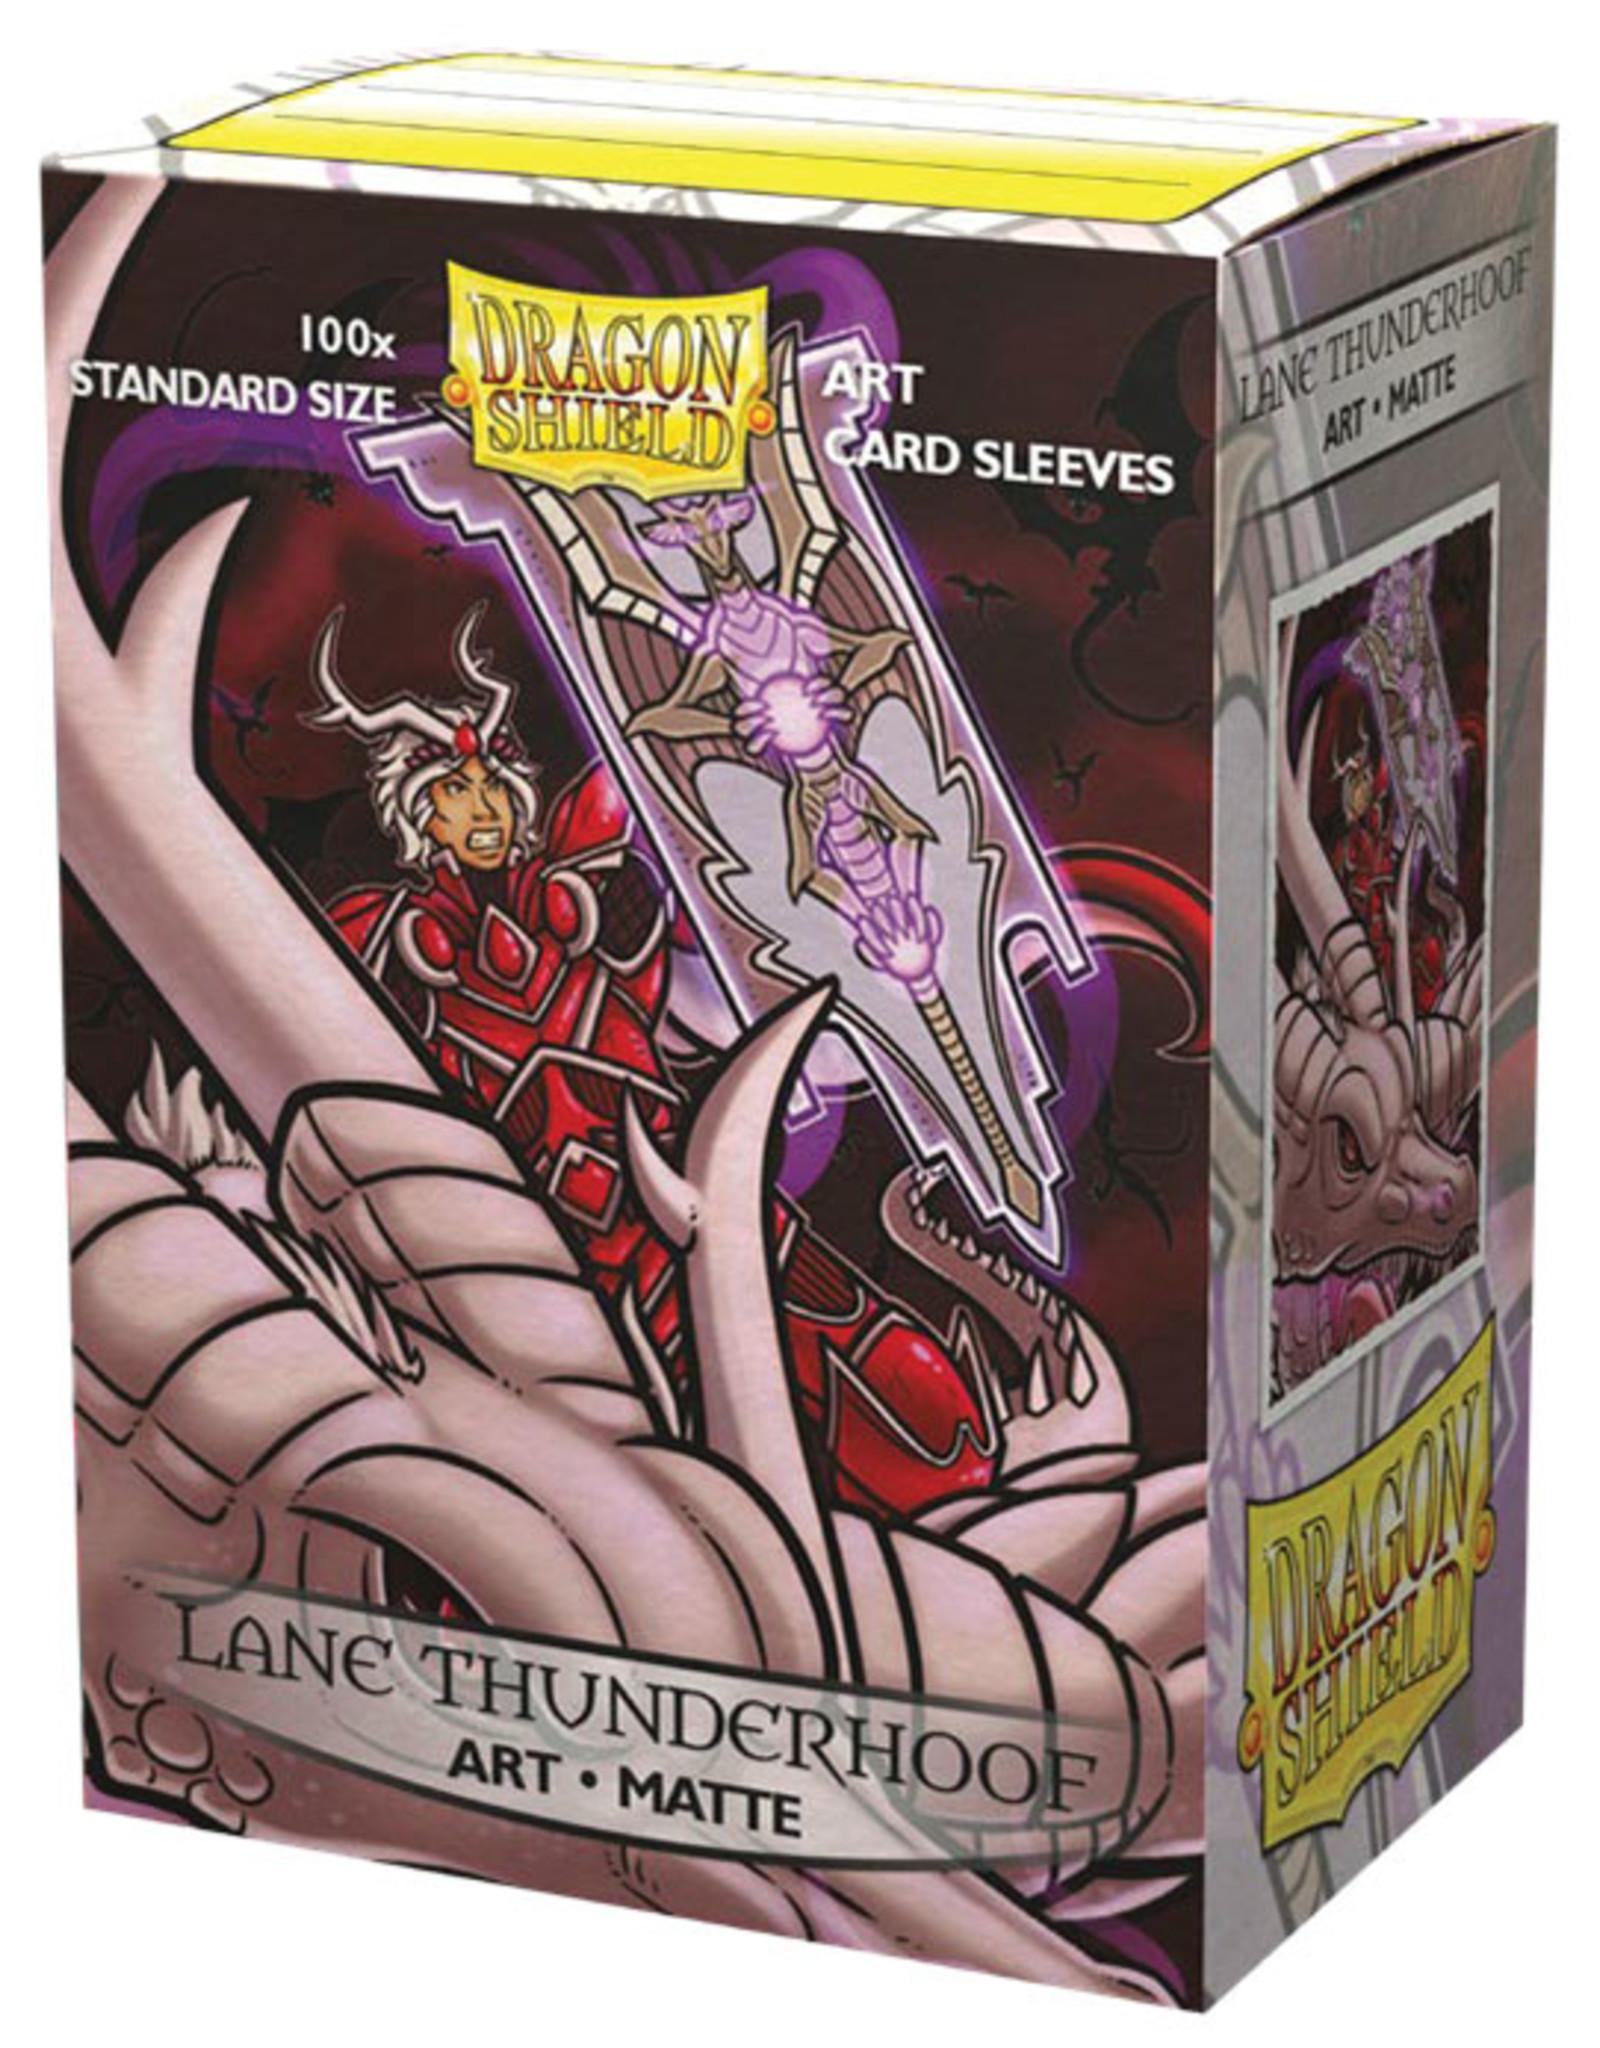 Dragon Shield: (100) Brushed Art Sleeves - Lane Thunderhoof Portrait